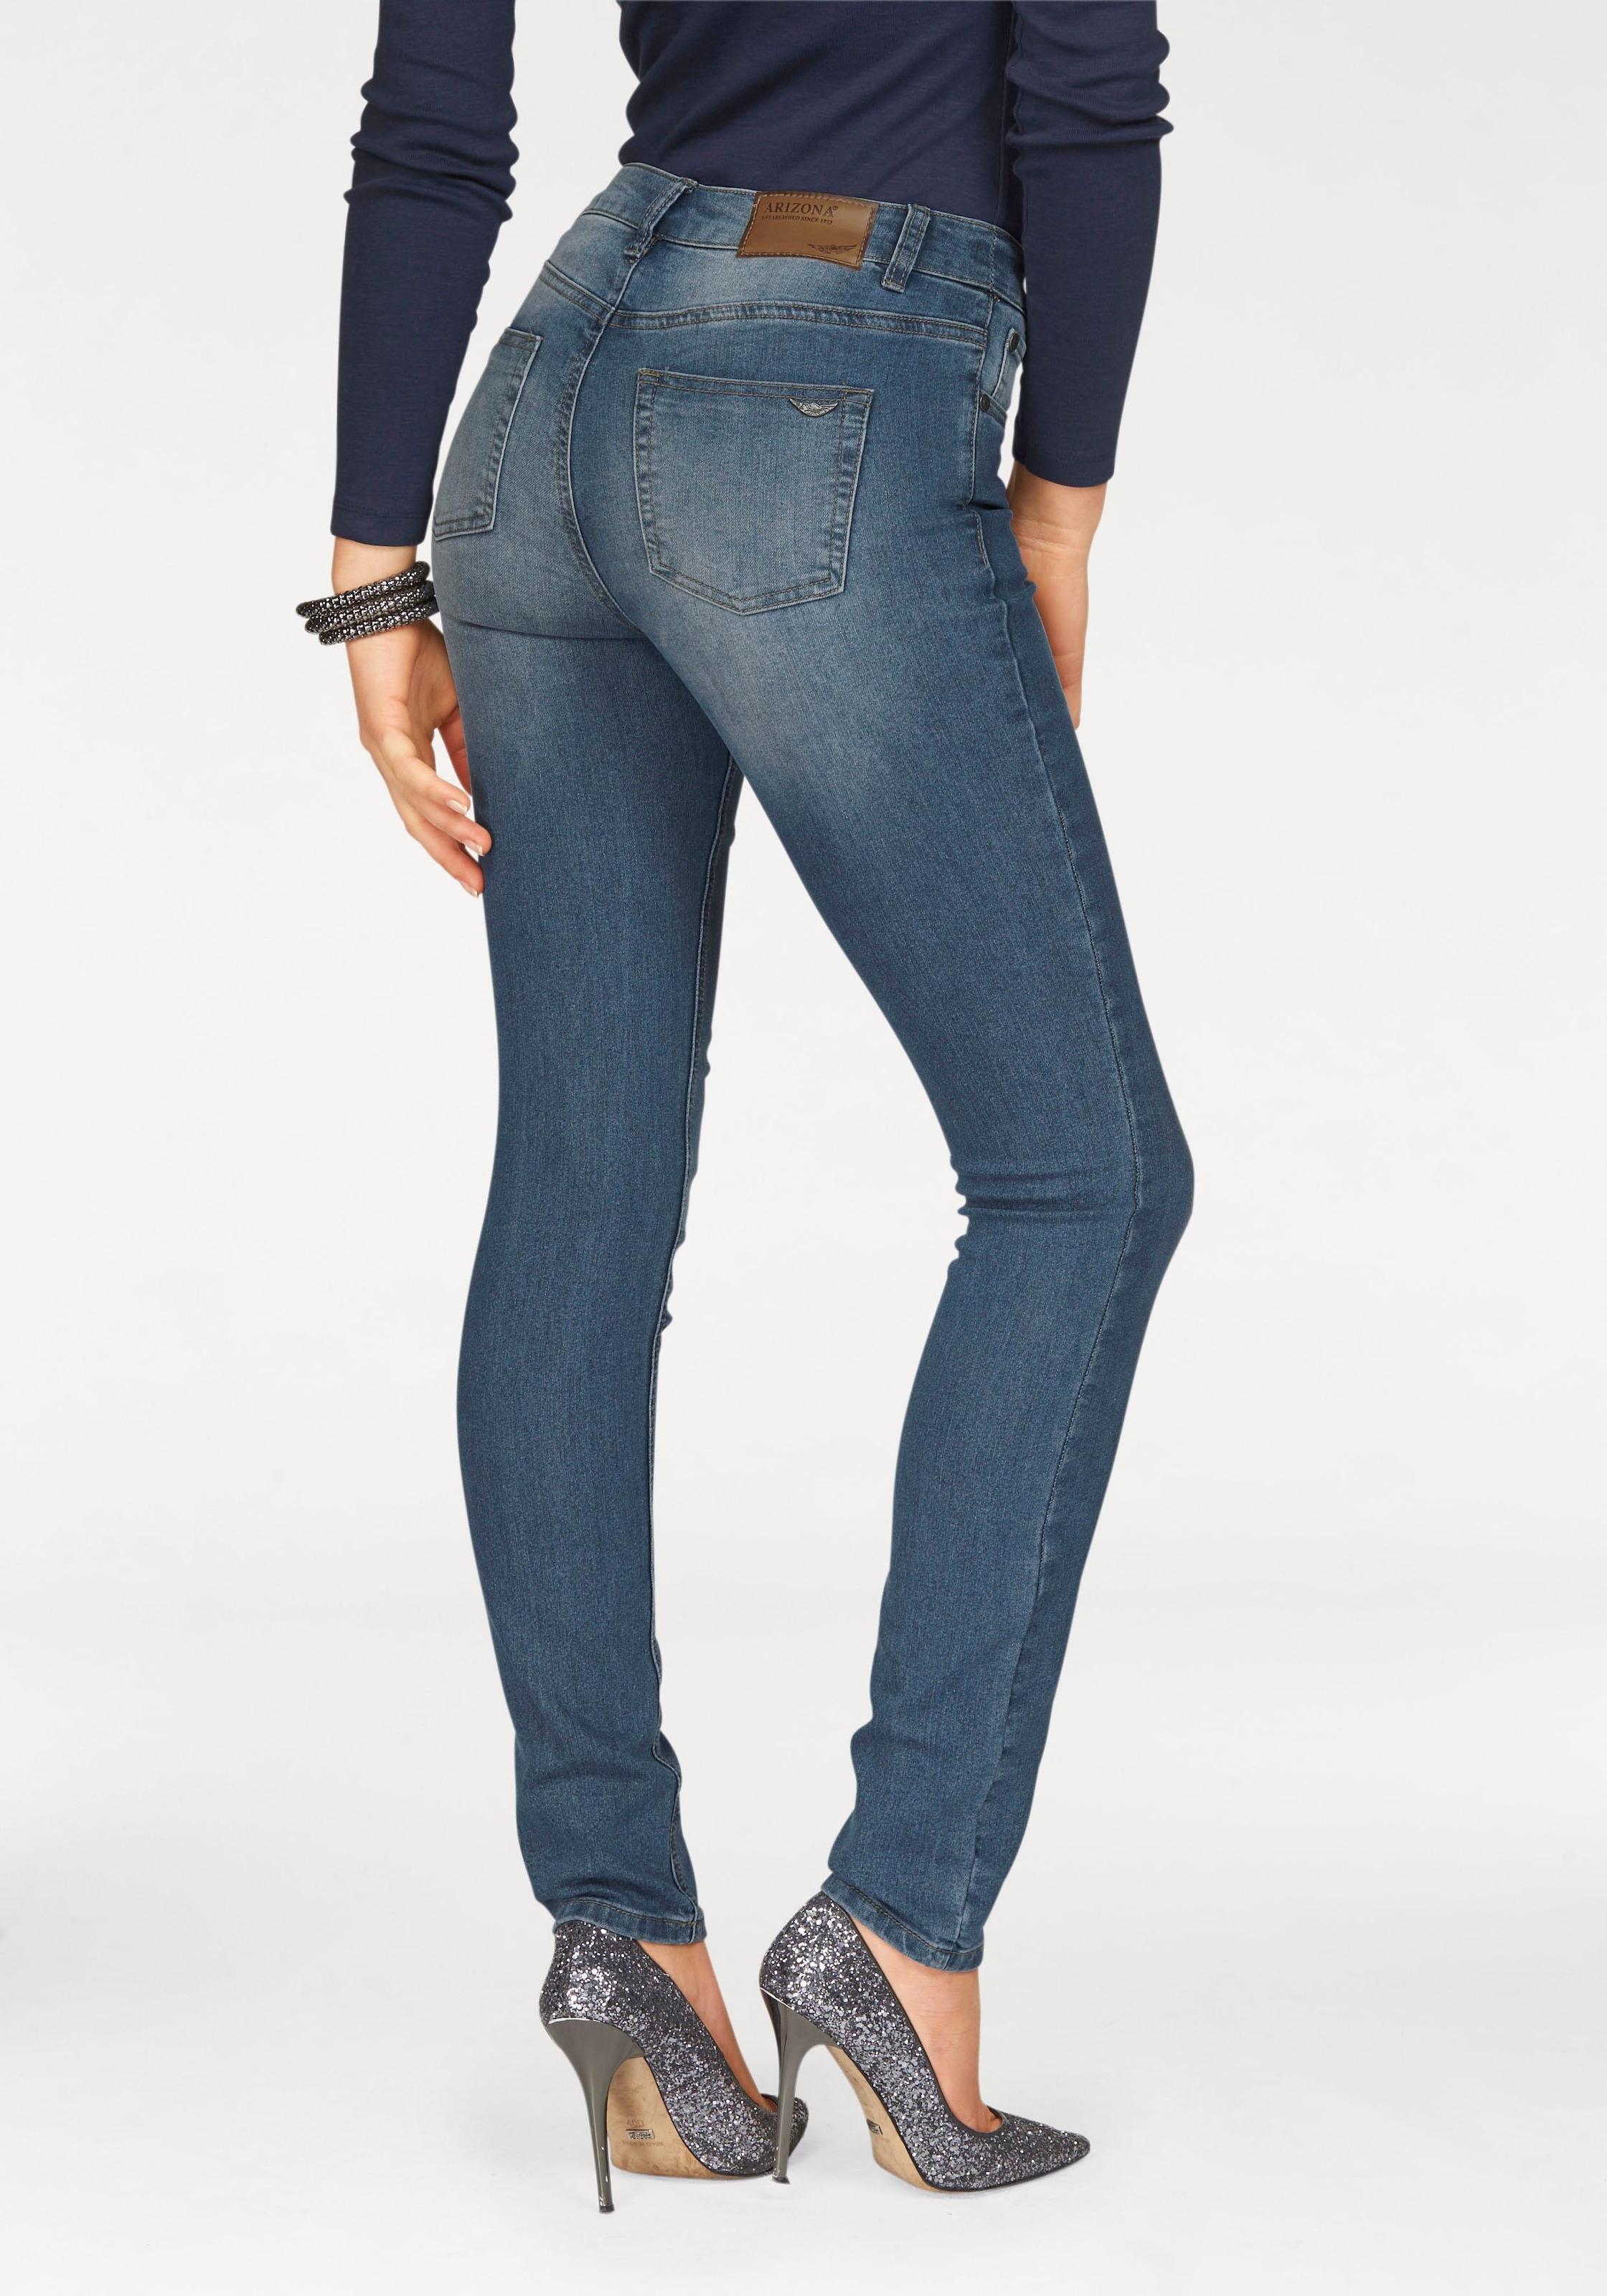 Details zu Arizona Skinny fit Jeans Shaping Jeans Damen High Waist Jeans